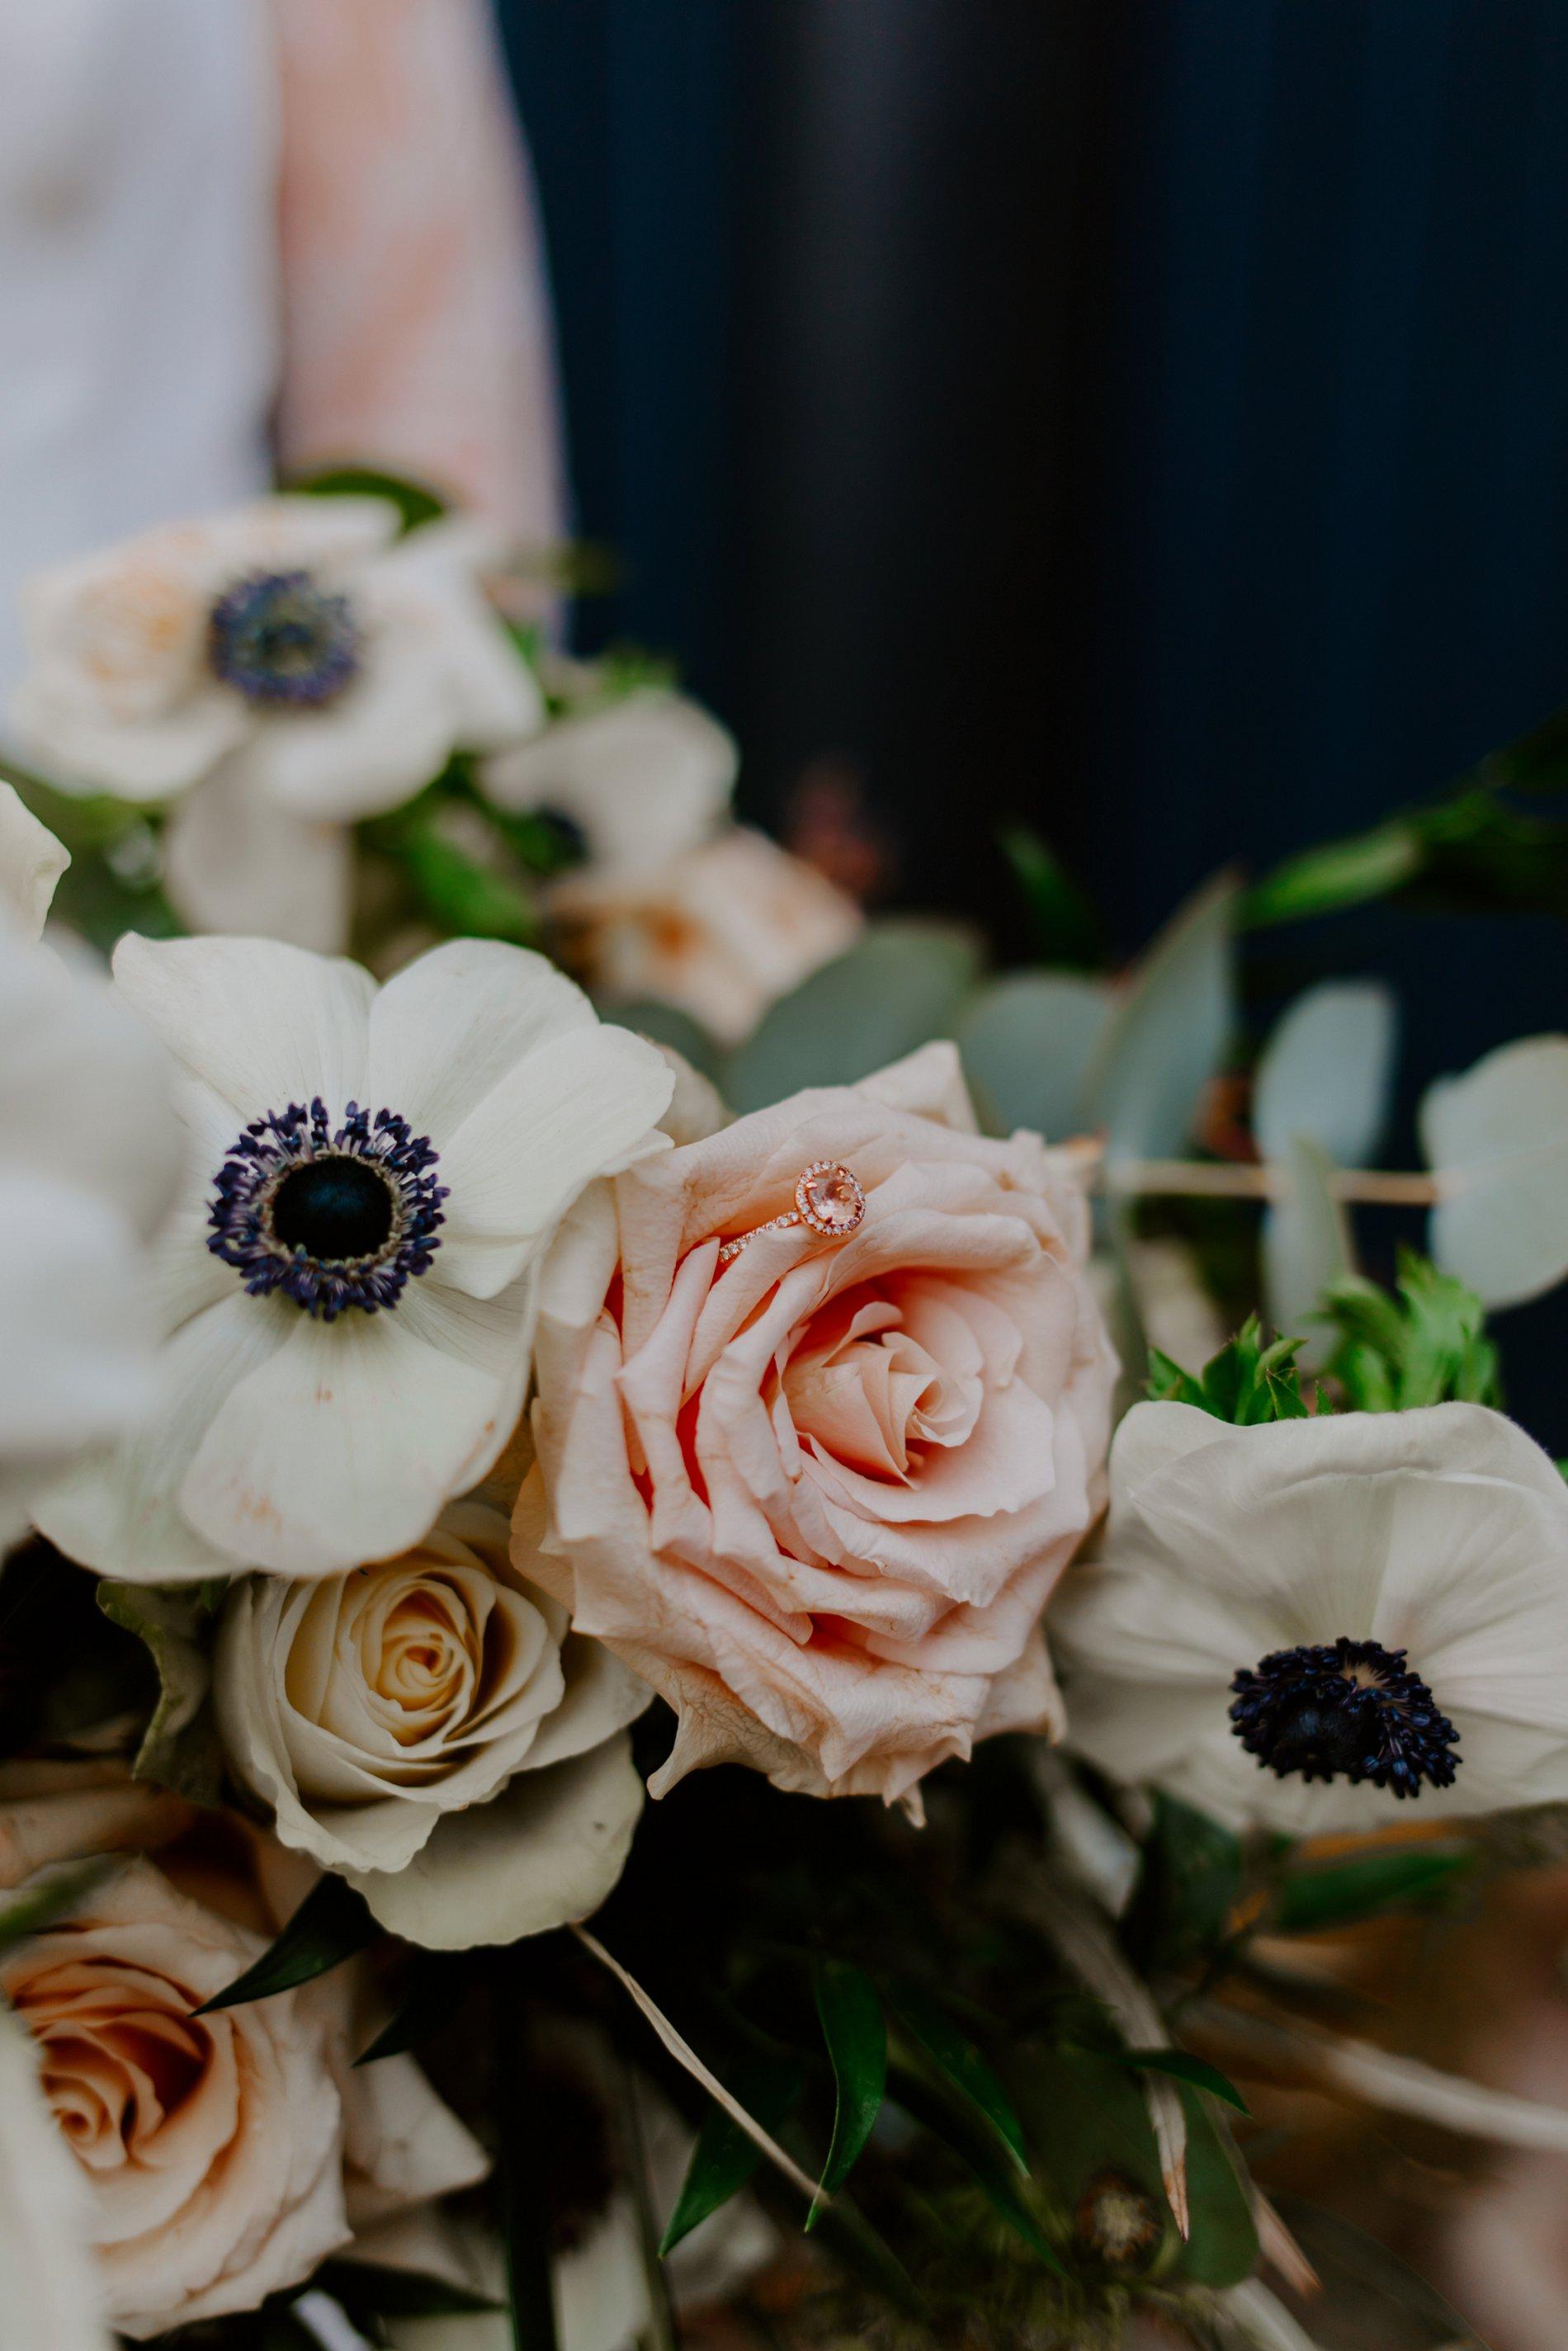 City Wedding Styled Shoot at Coal Drops Yard (c) Emztography (14)